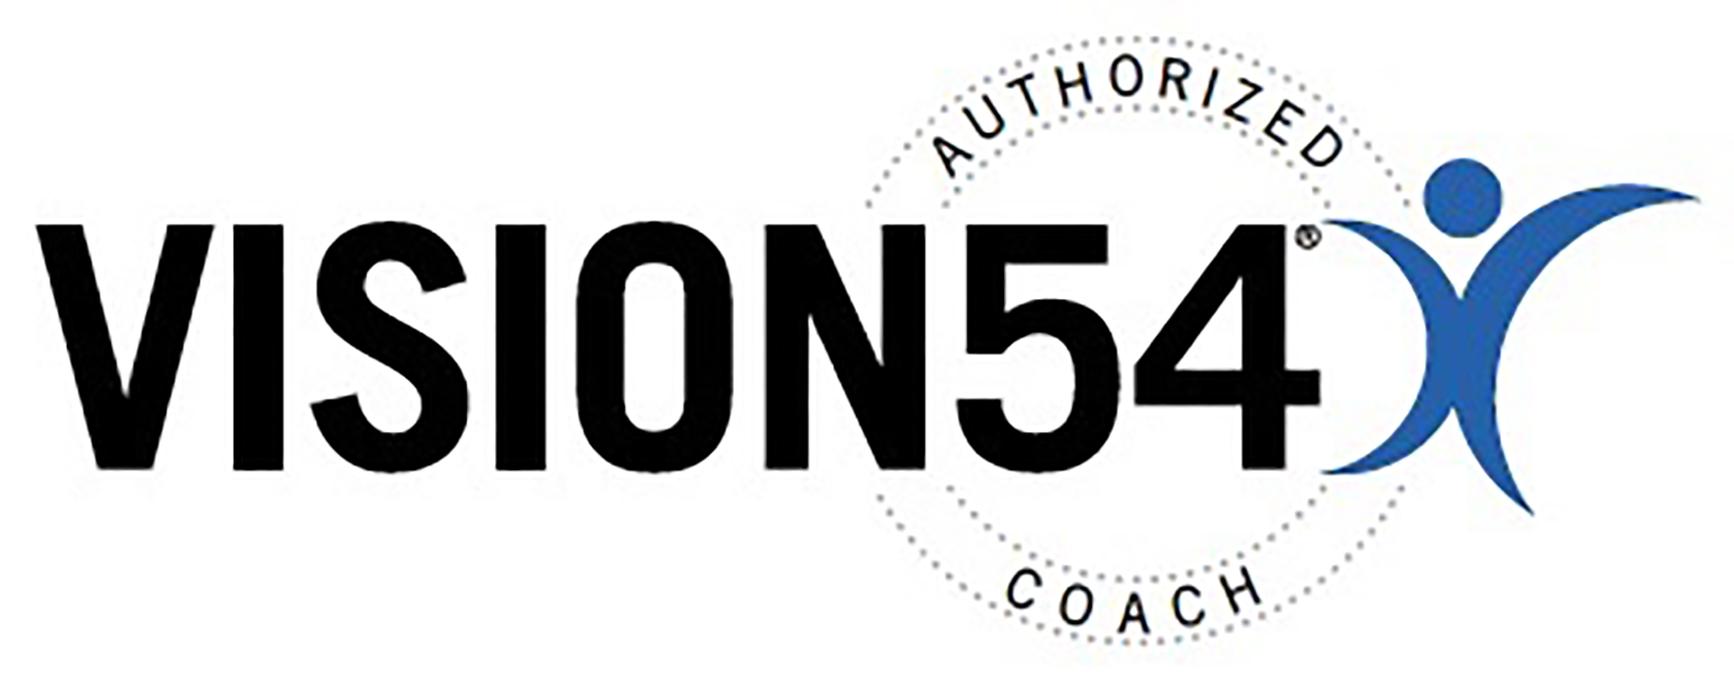 Authorized coach logo.jpg